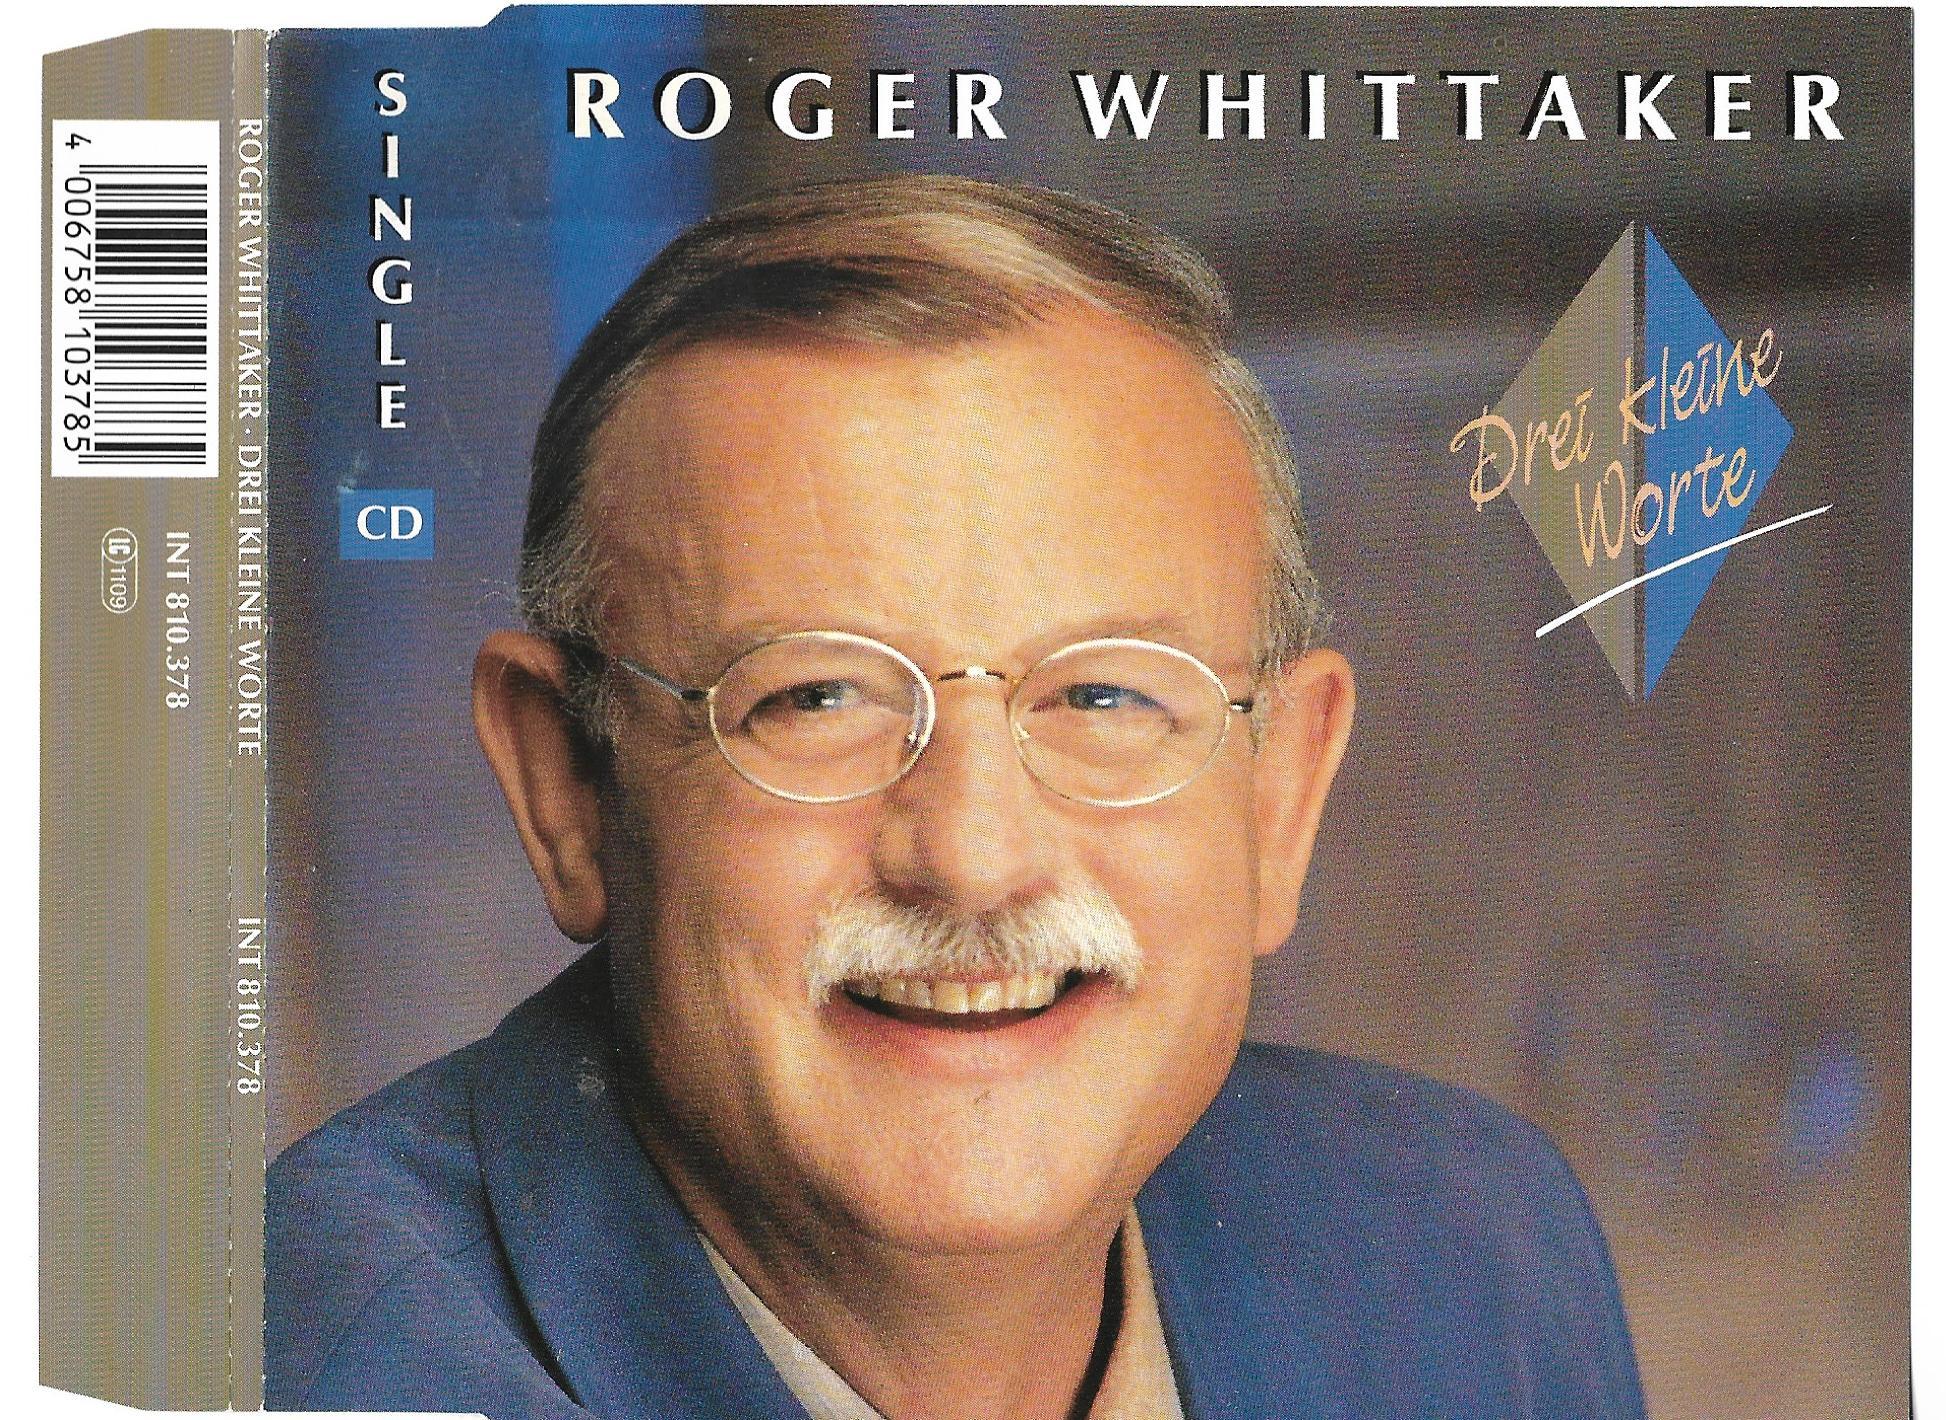 ROGER WHITTAKER - Drei Keine worte  2 tracks jewel case - MCD